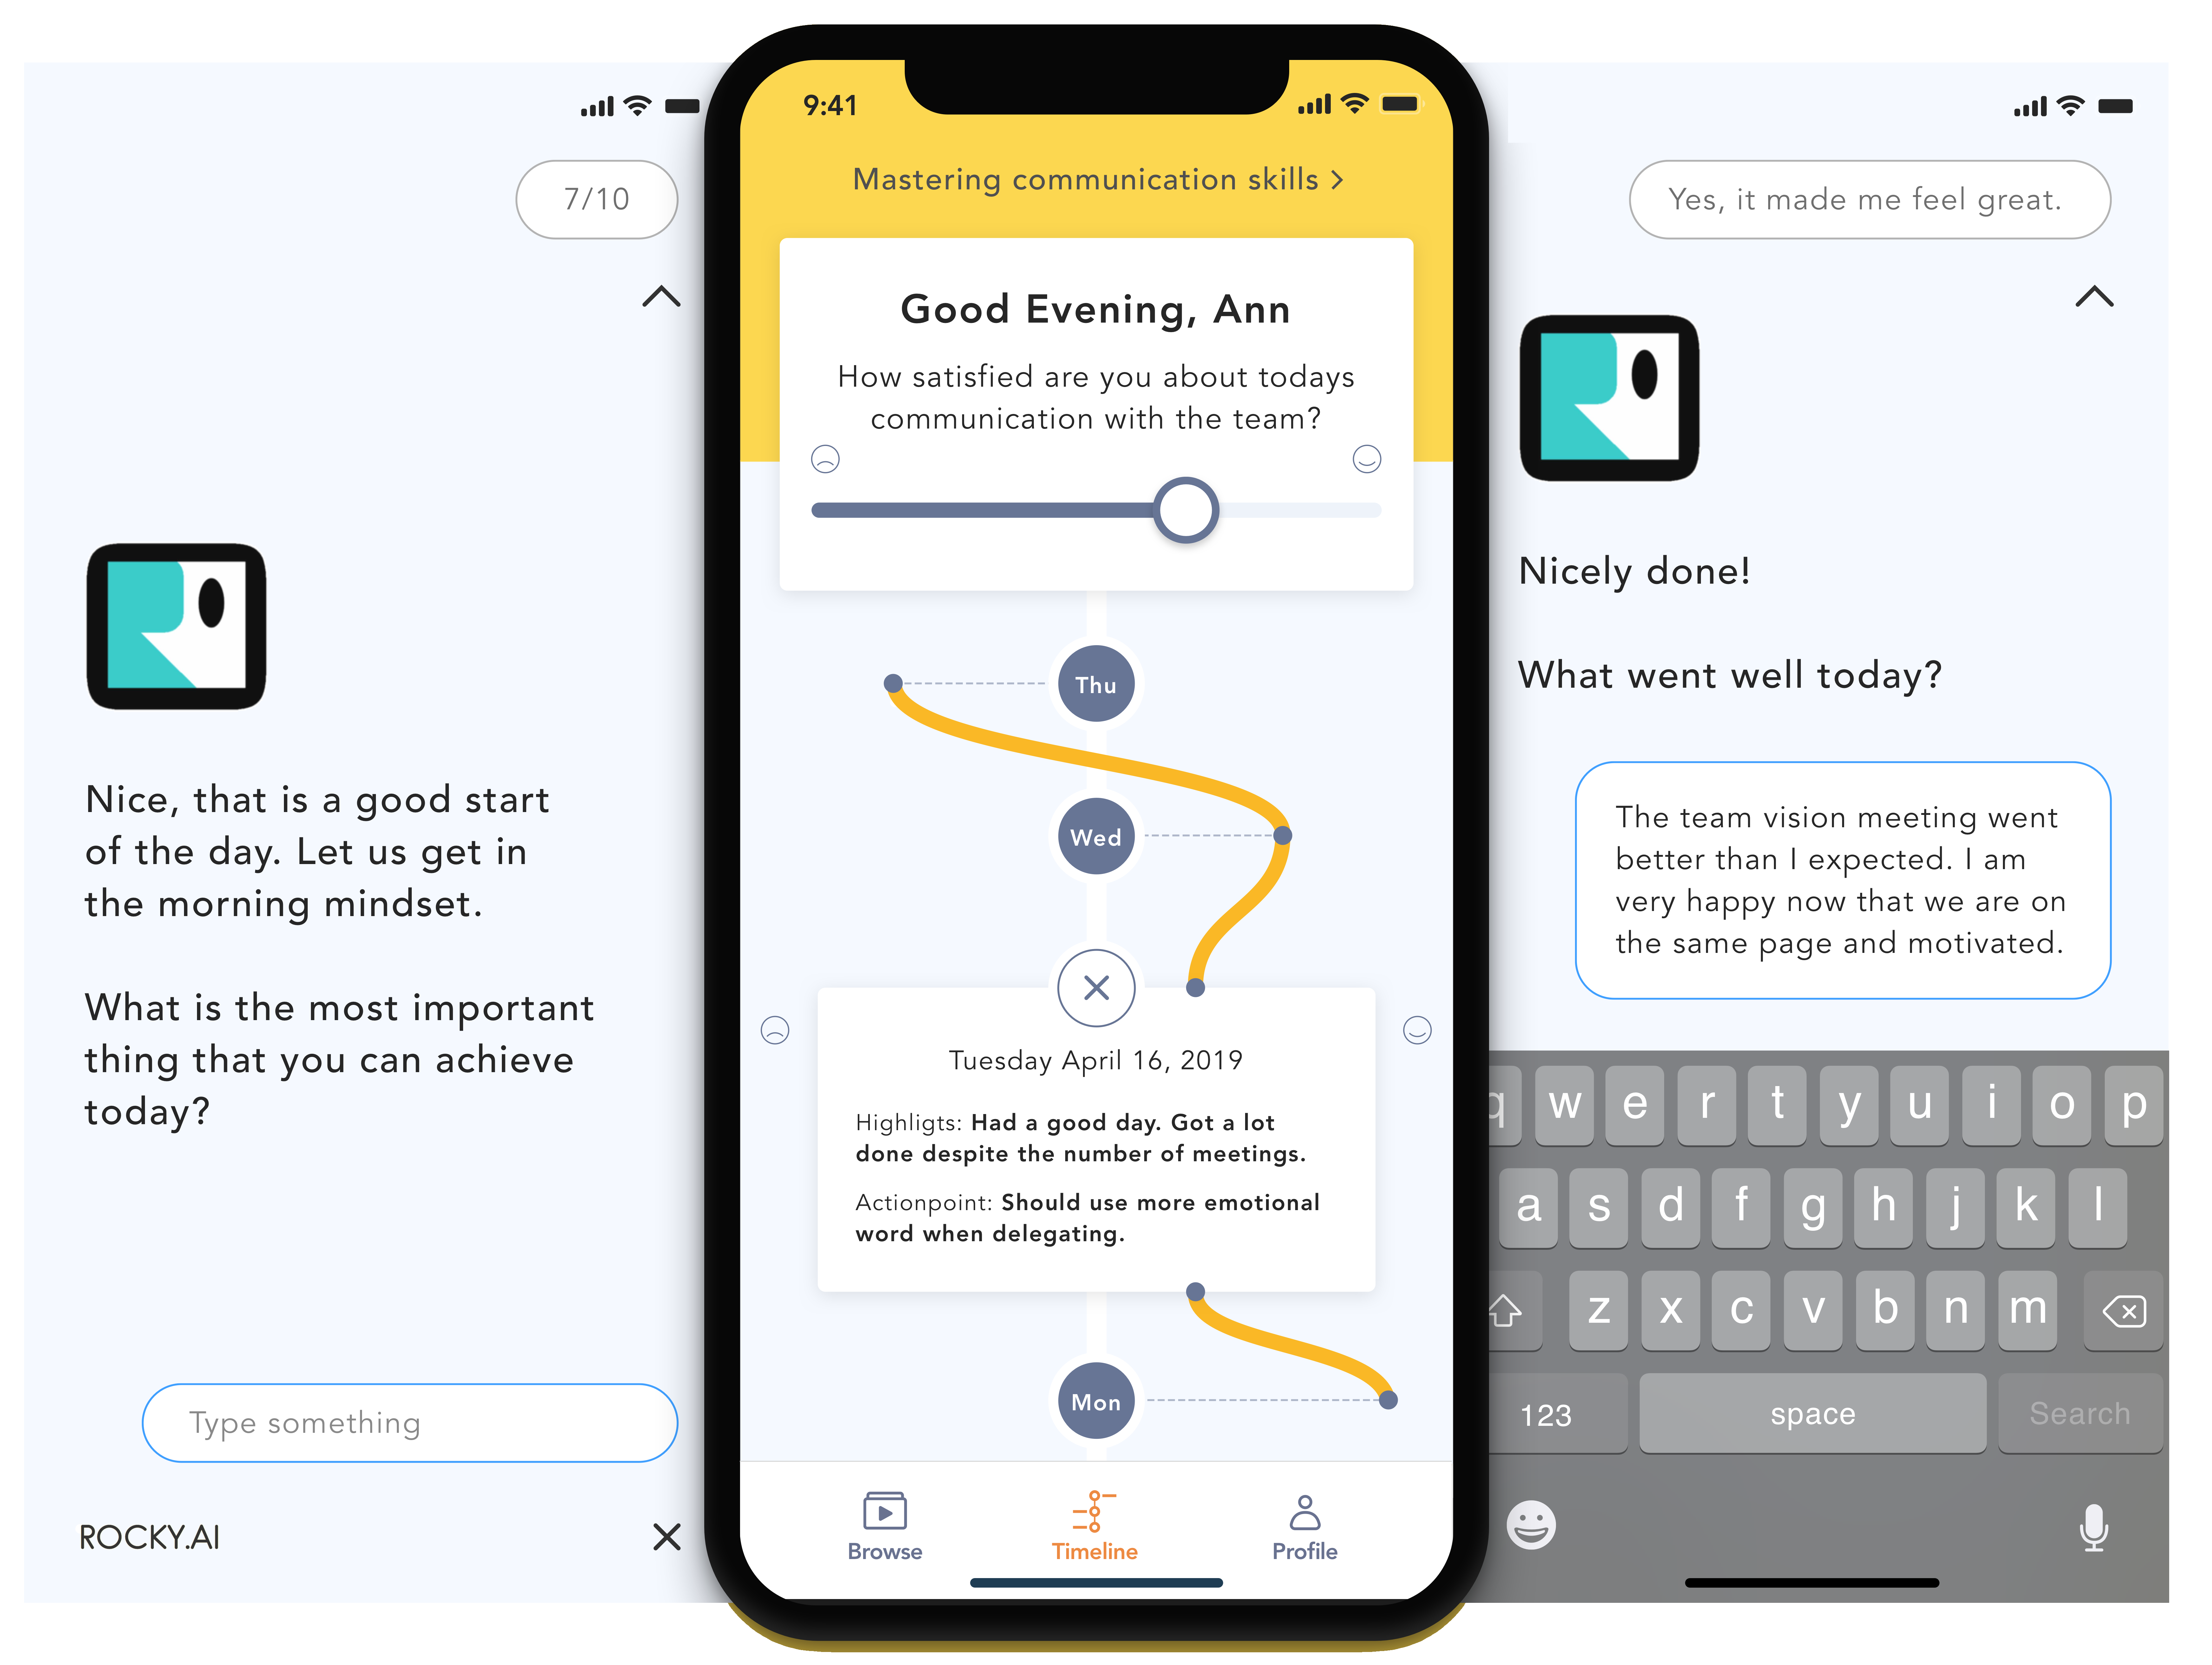 App ROCKY.AI journaling